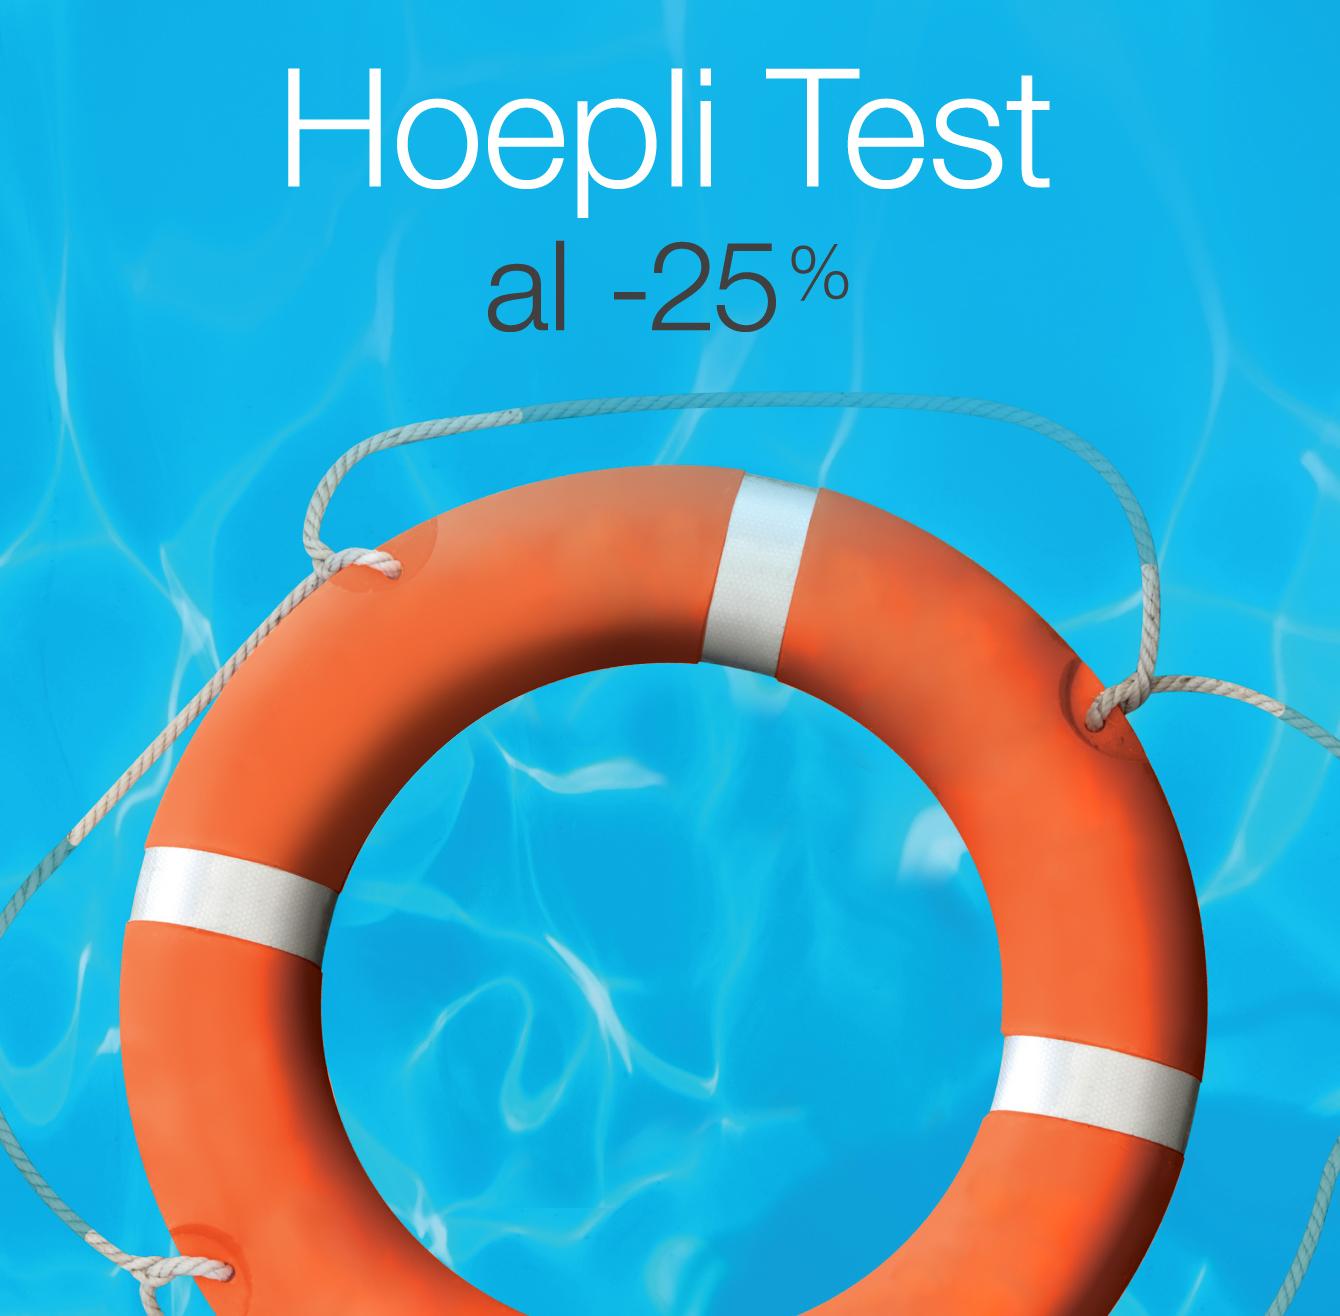 Hoepli Test al -25%